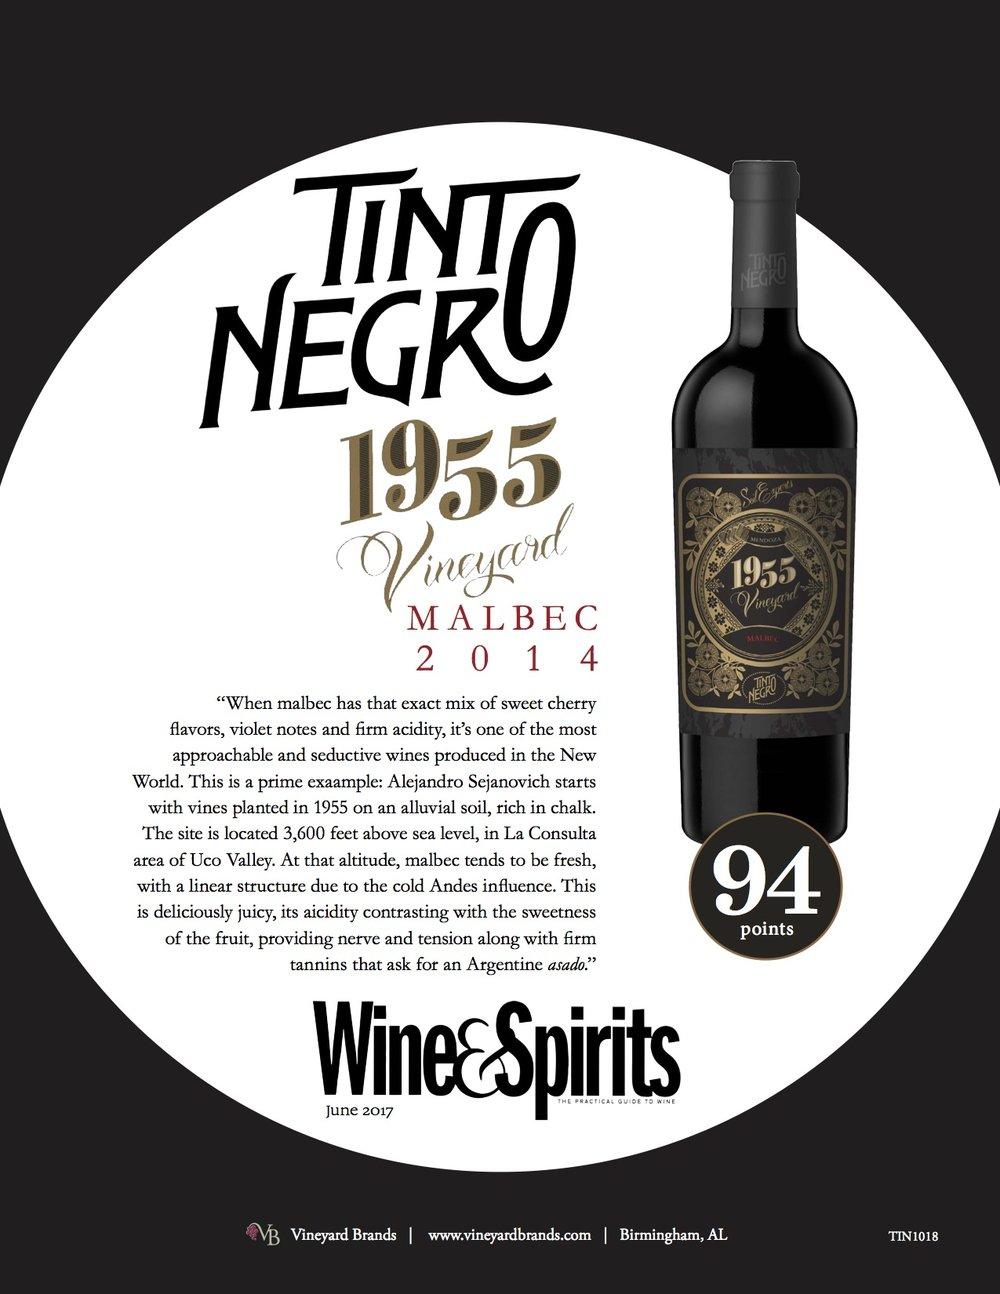 Tinto Negro 1955 Vineyard Malbec 2014.jpg